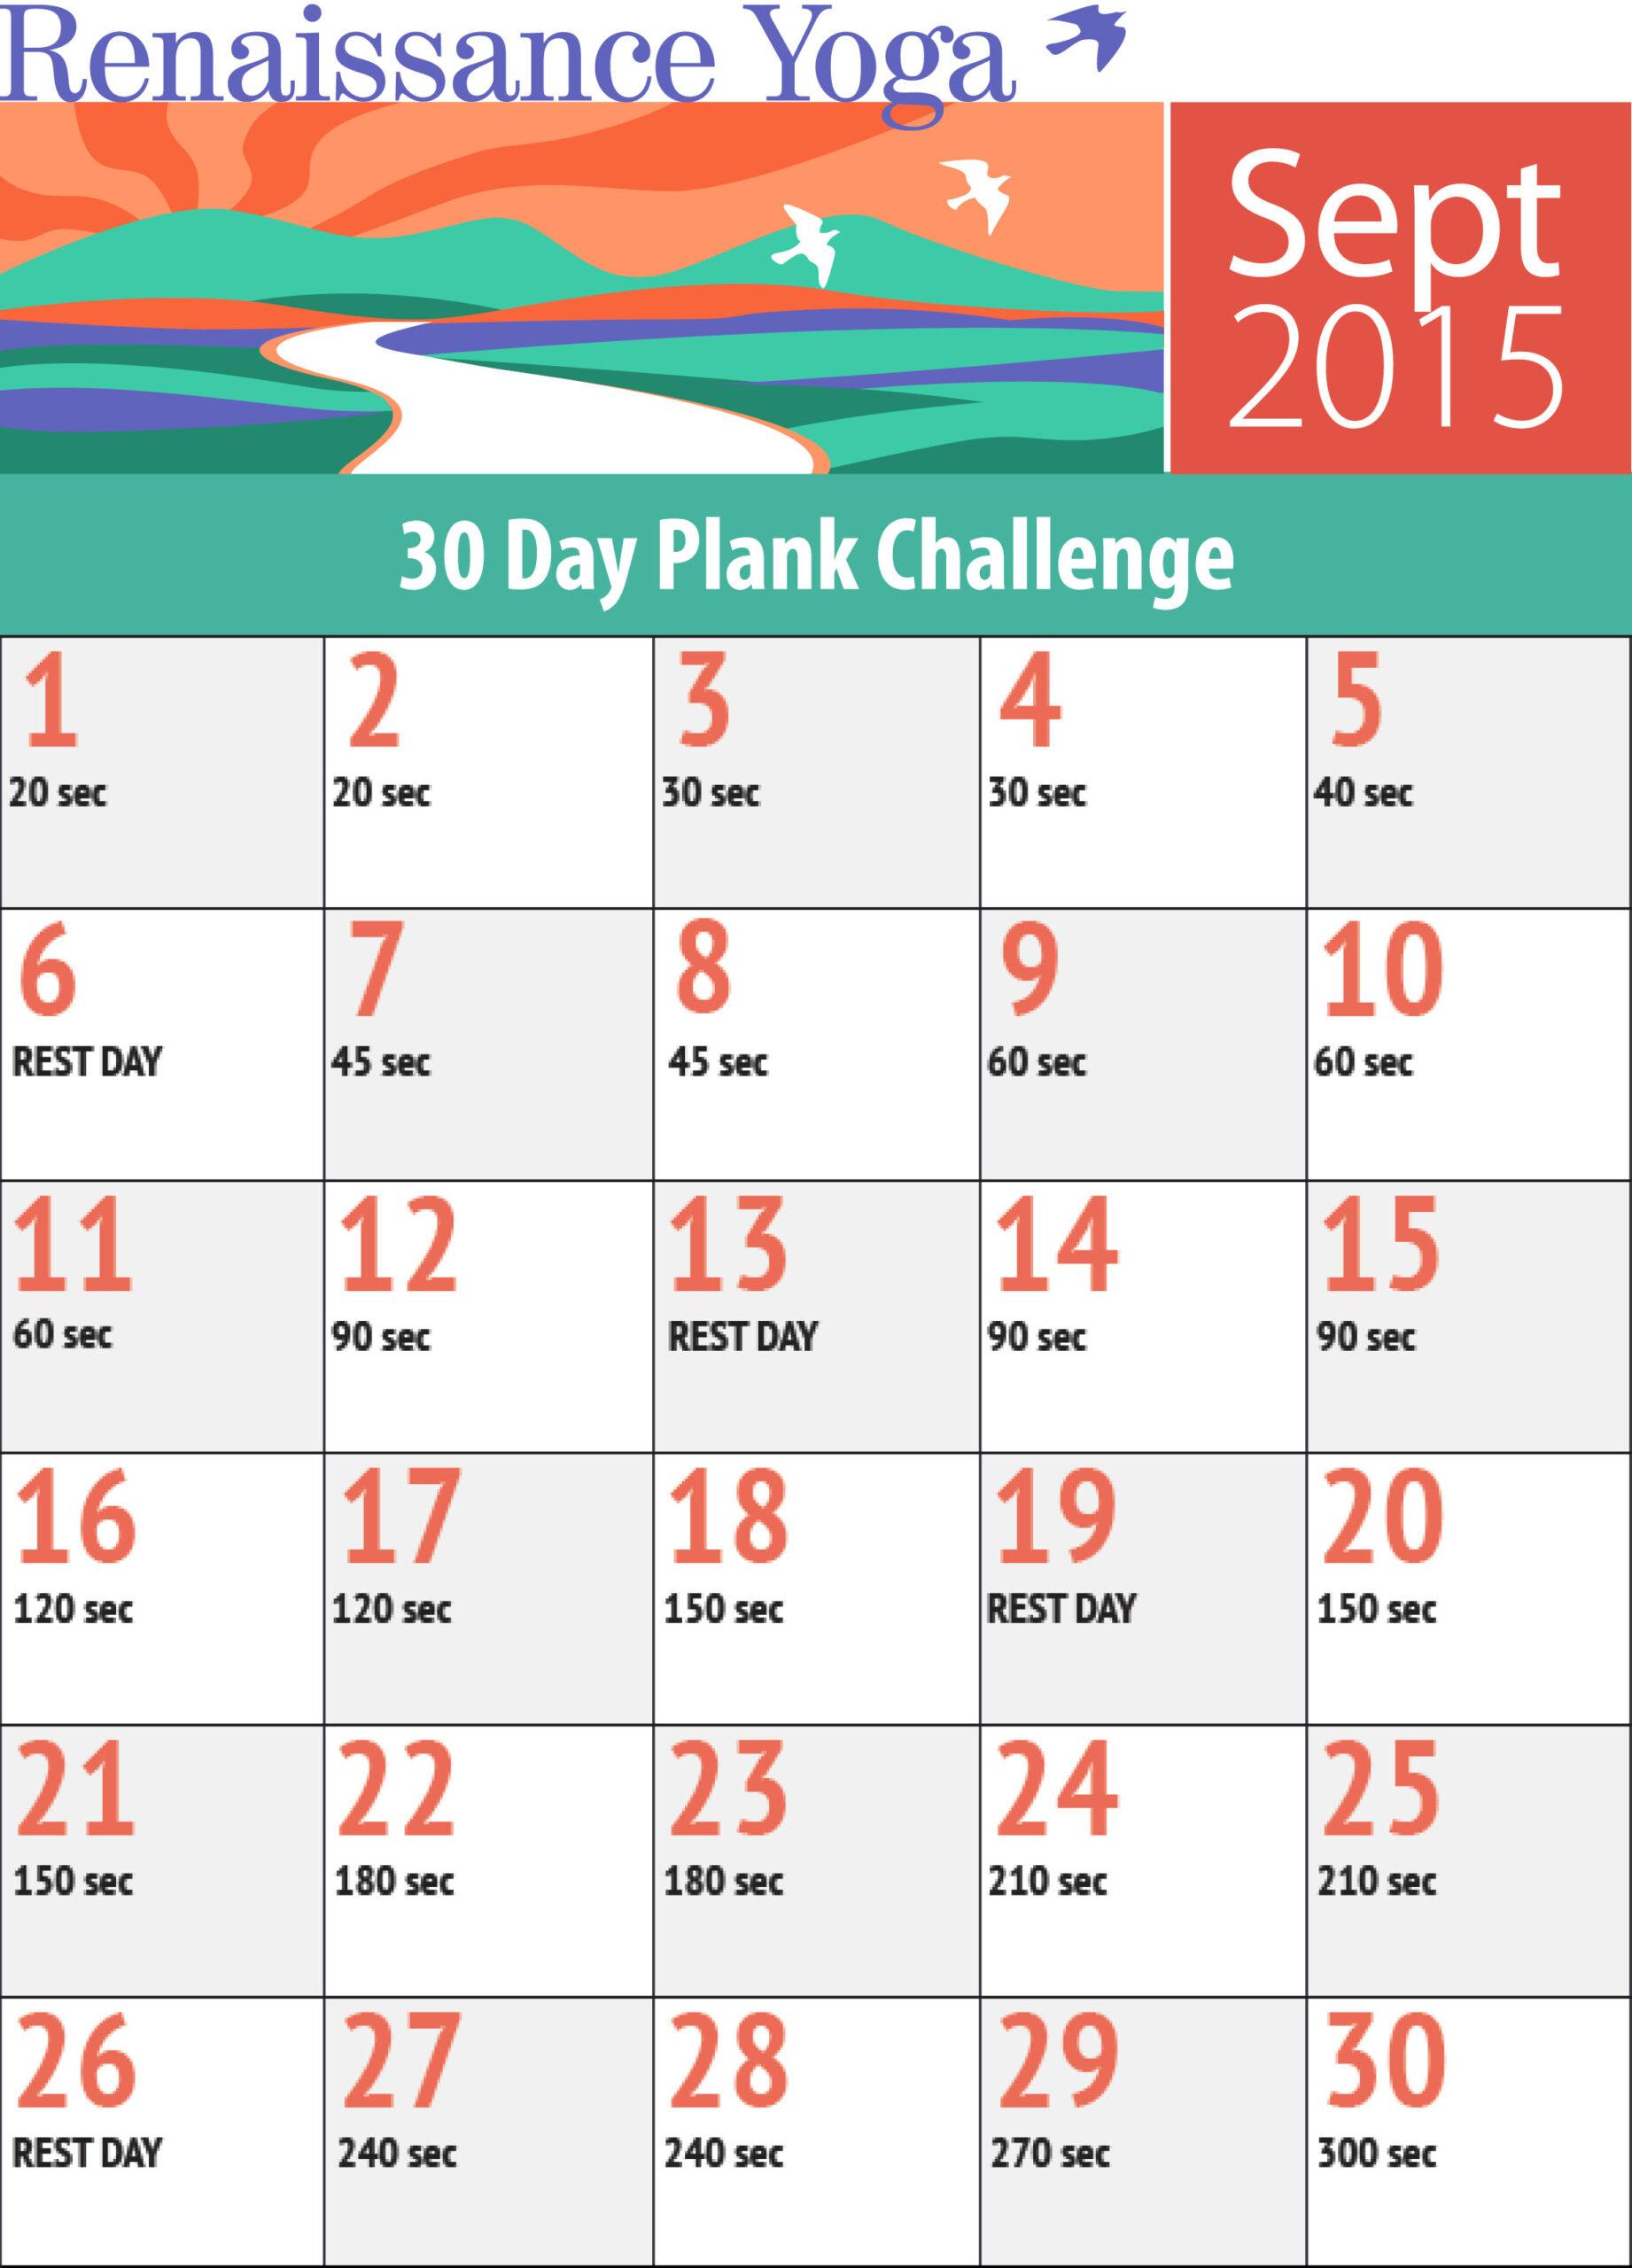 Plank Challenge: Sep 2015